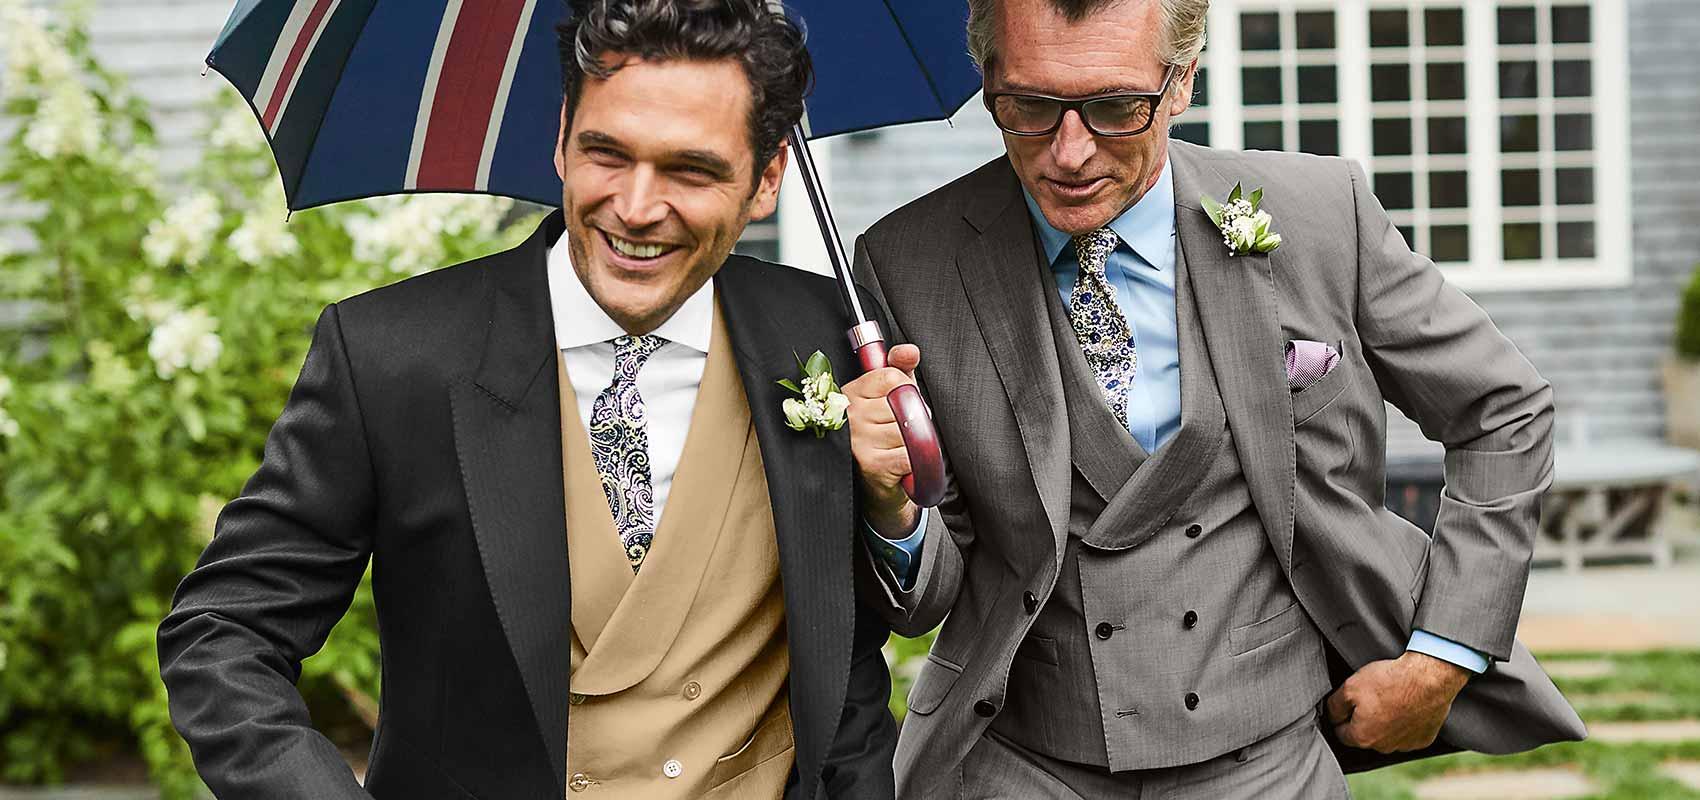 Charles Tyrwhitt men's wedding wardrobe